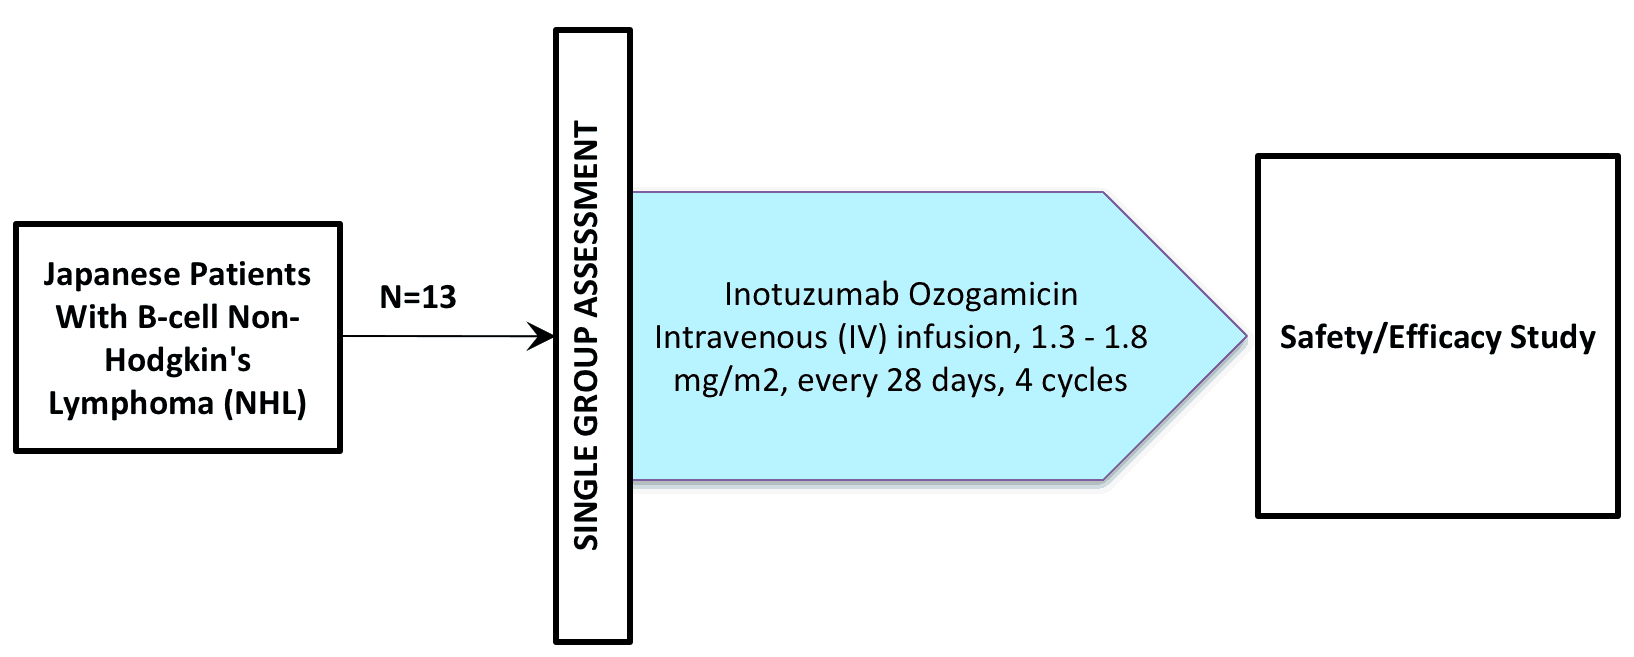 NCT00717925 (Clinical Trial / inotuzumab ozogamycin / CMC-544)